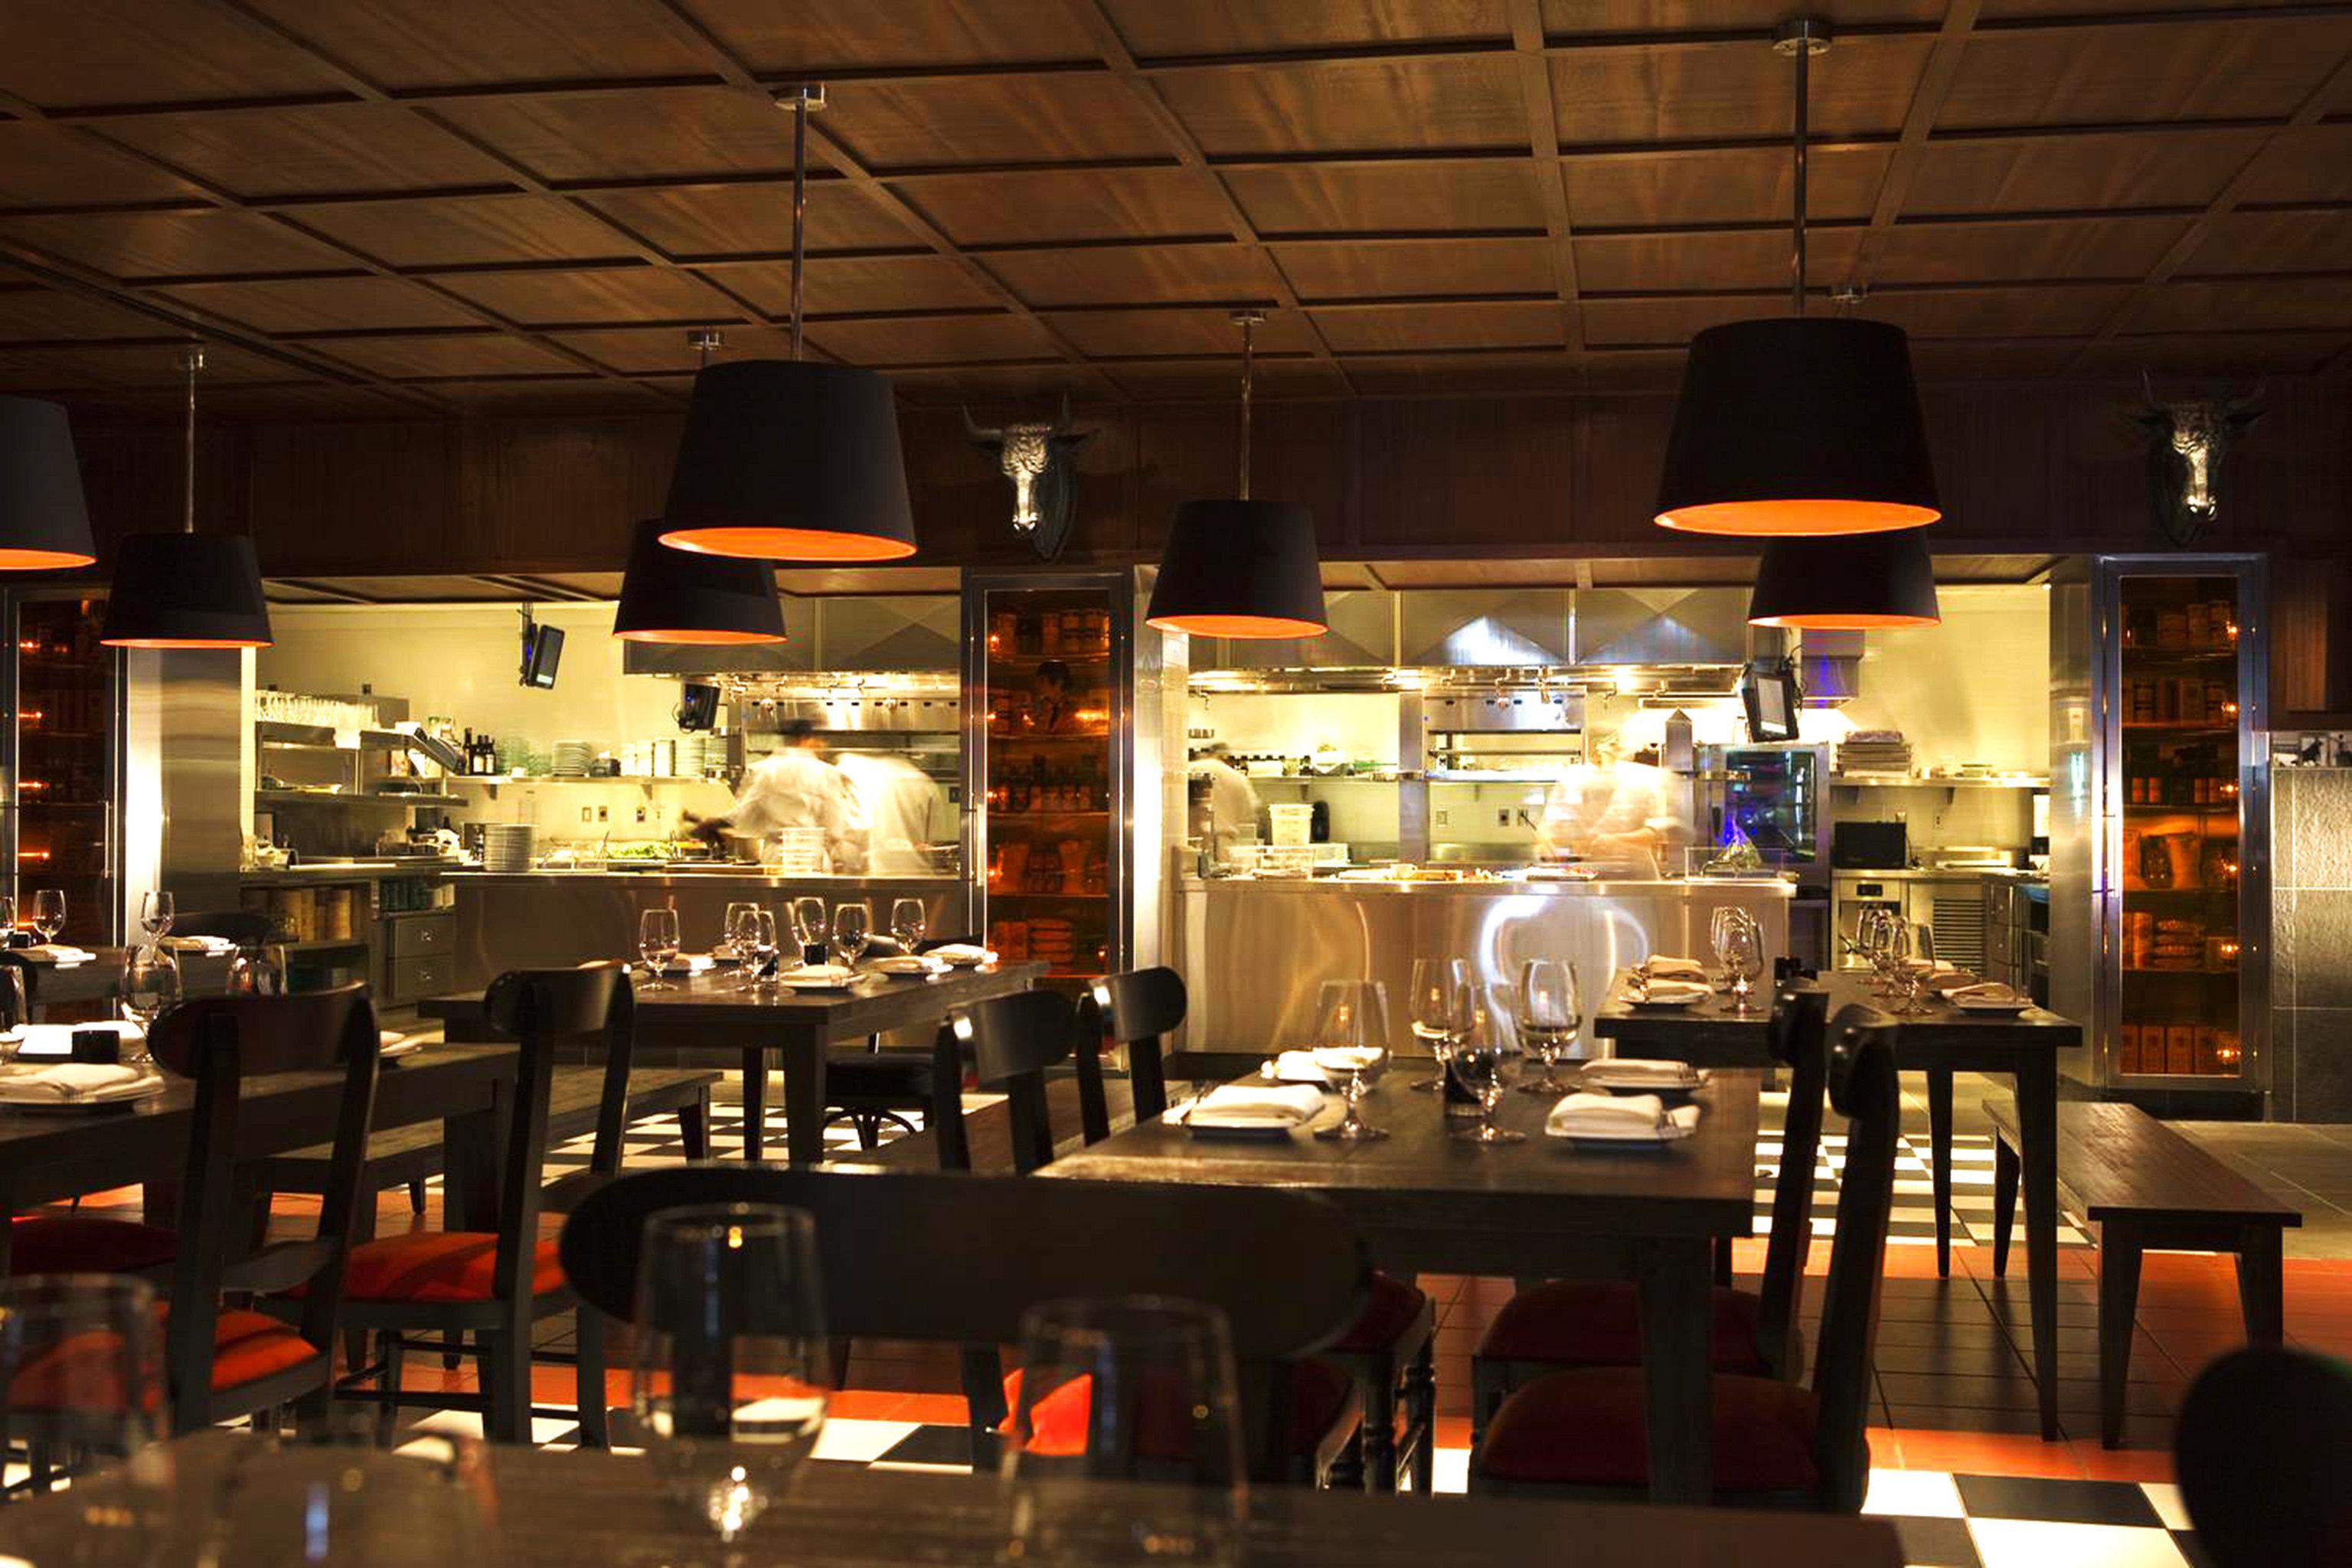 City Dining Drink Eat Kitchen Modern restaurant café Bar